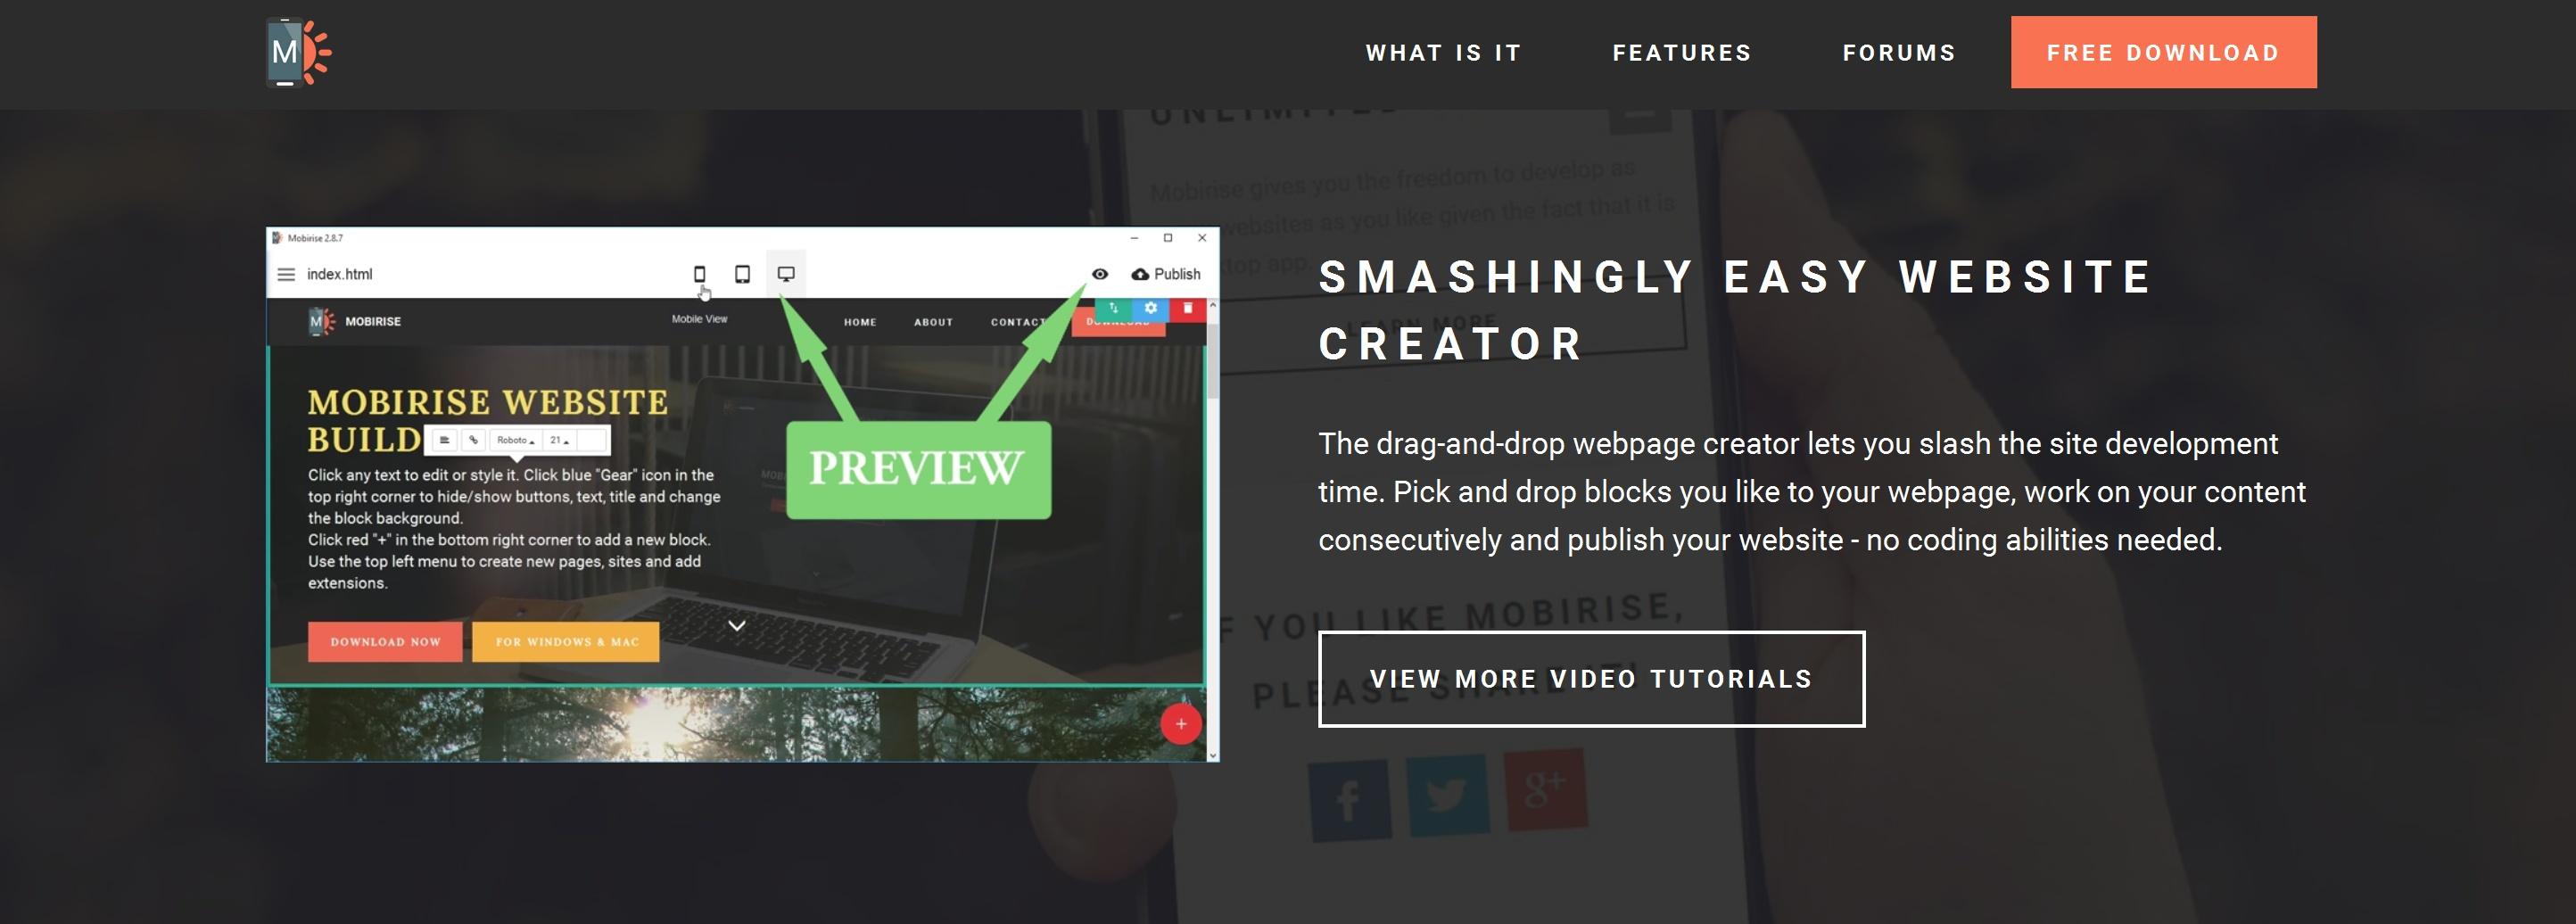 Free HTML5 Web Page  Creator